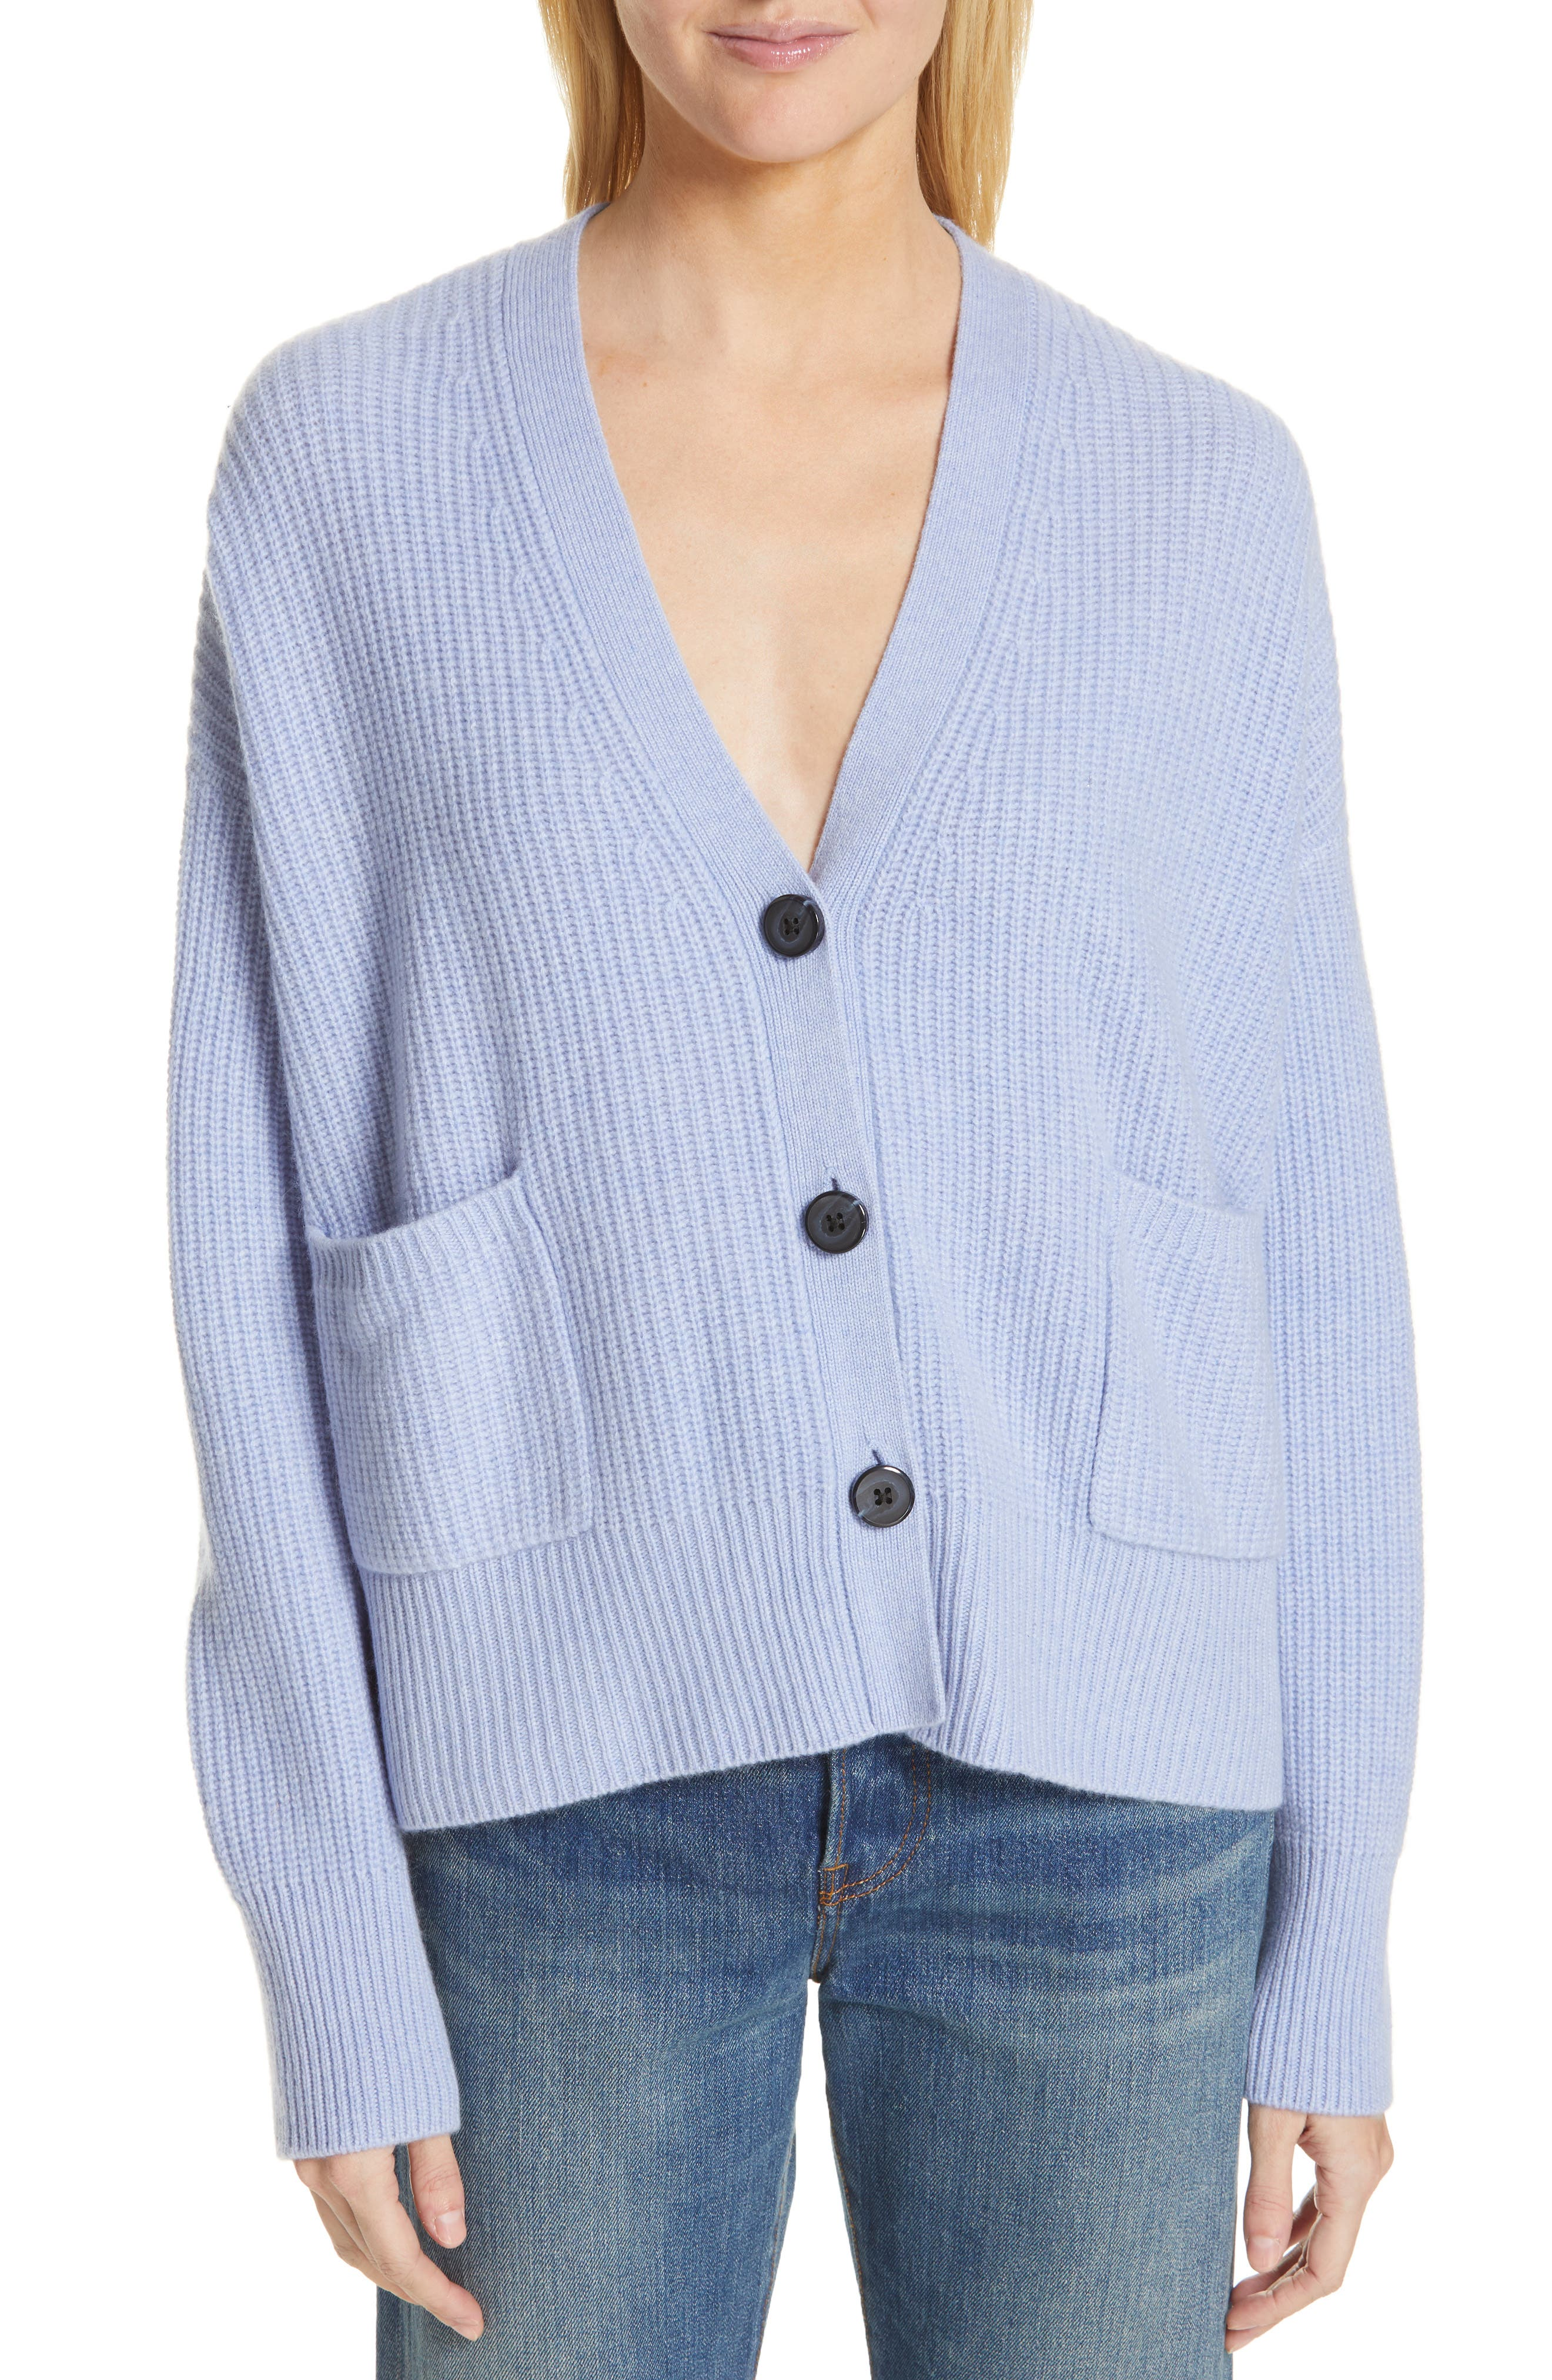 NORDSTROM SIGNATURE Cashmere Pocket Cardigan, Main, color, BLUE LUSTRE HEATHER